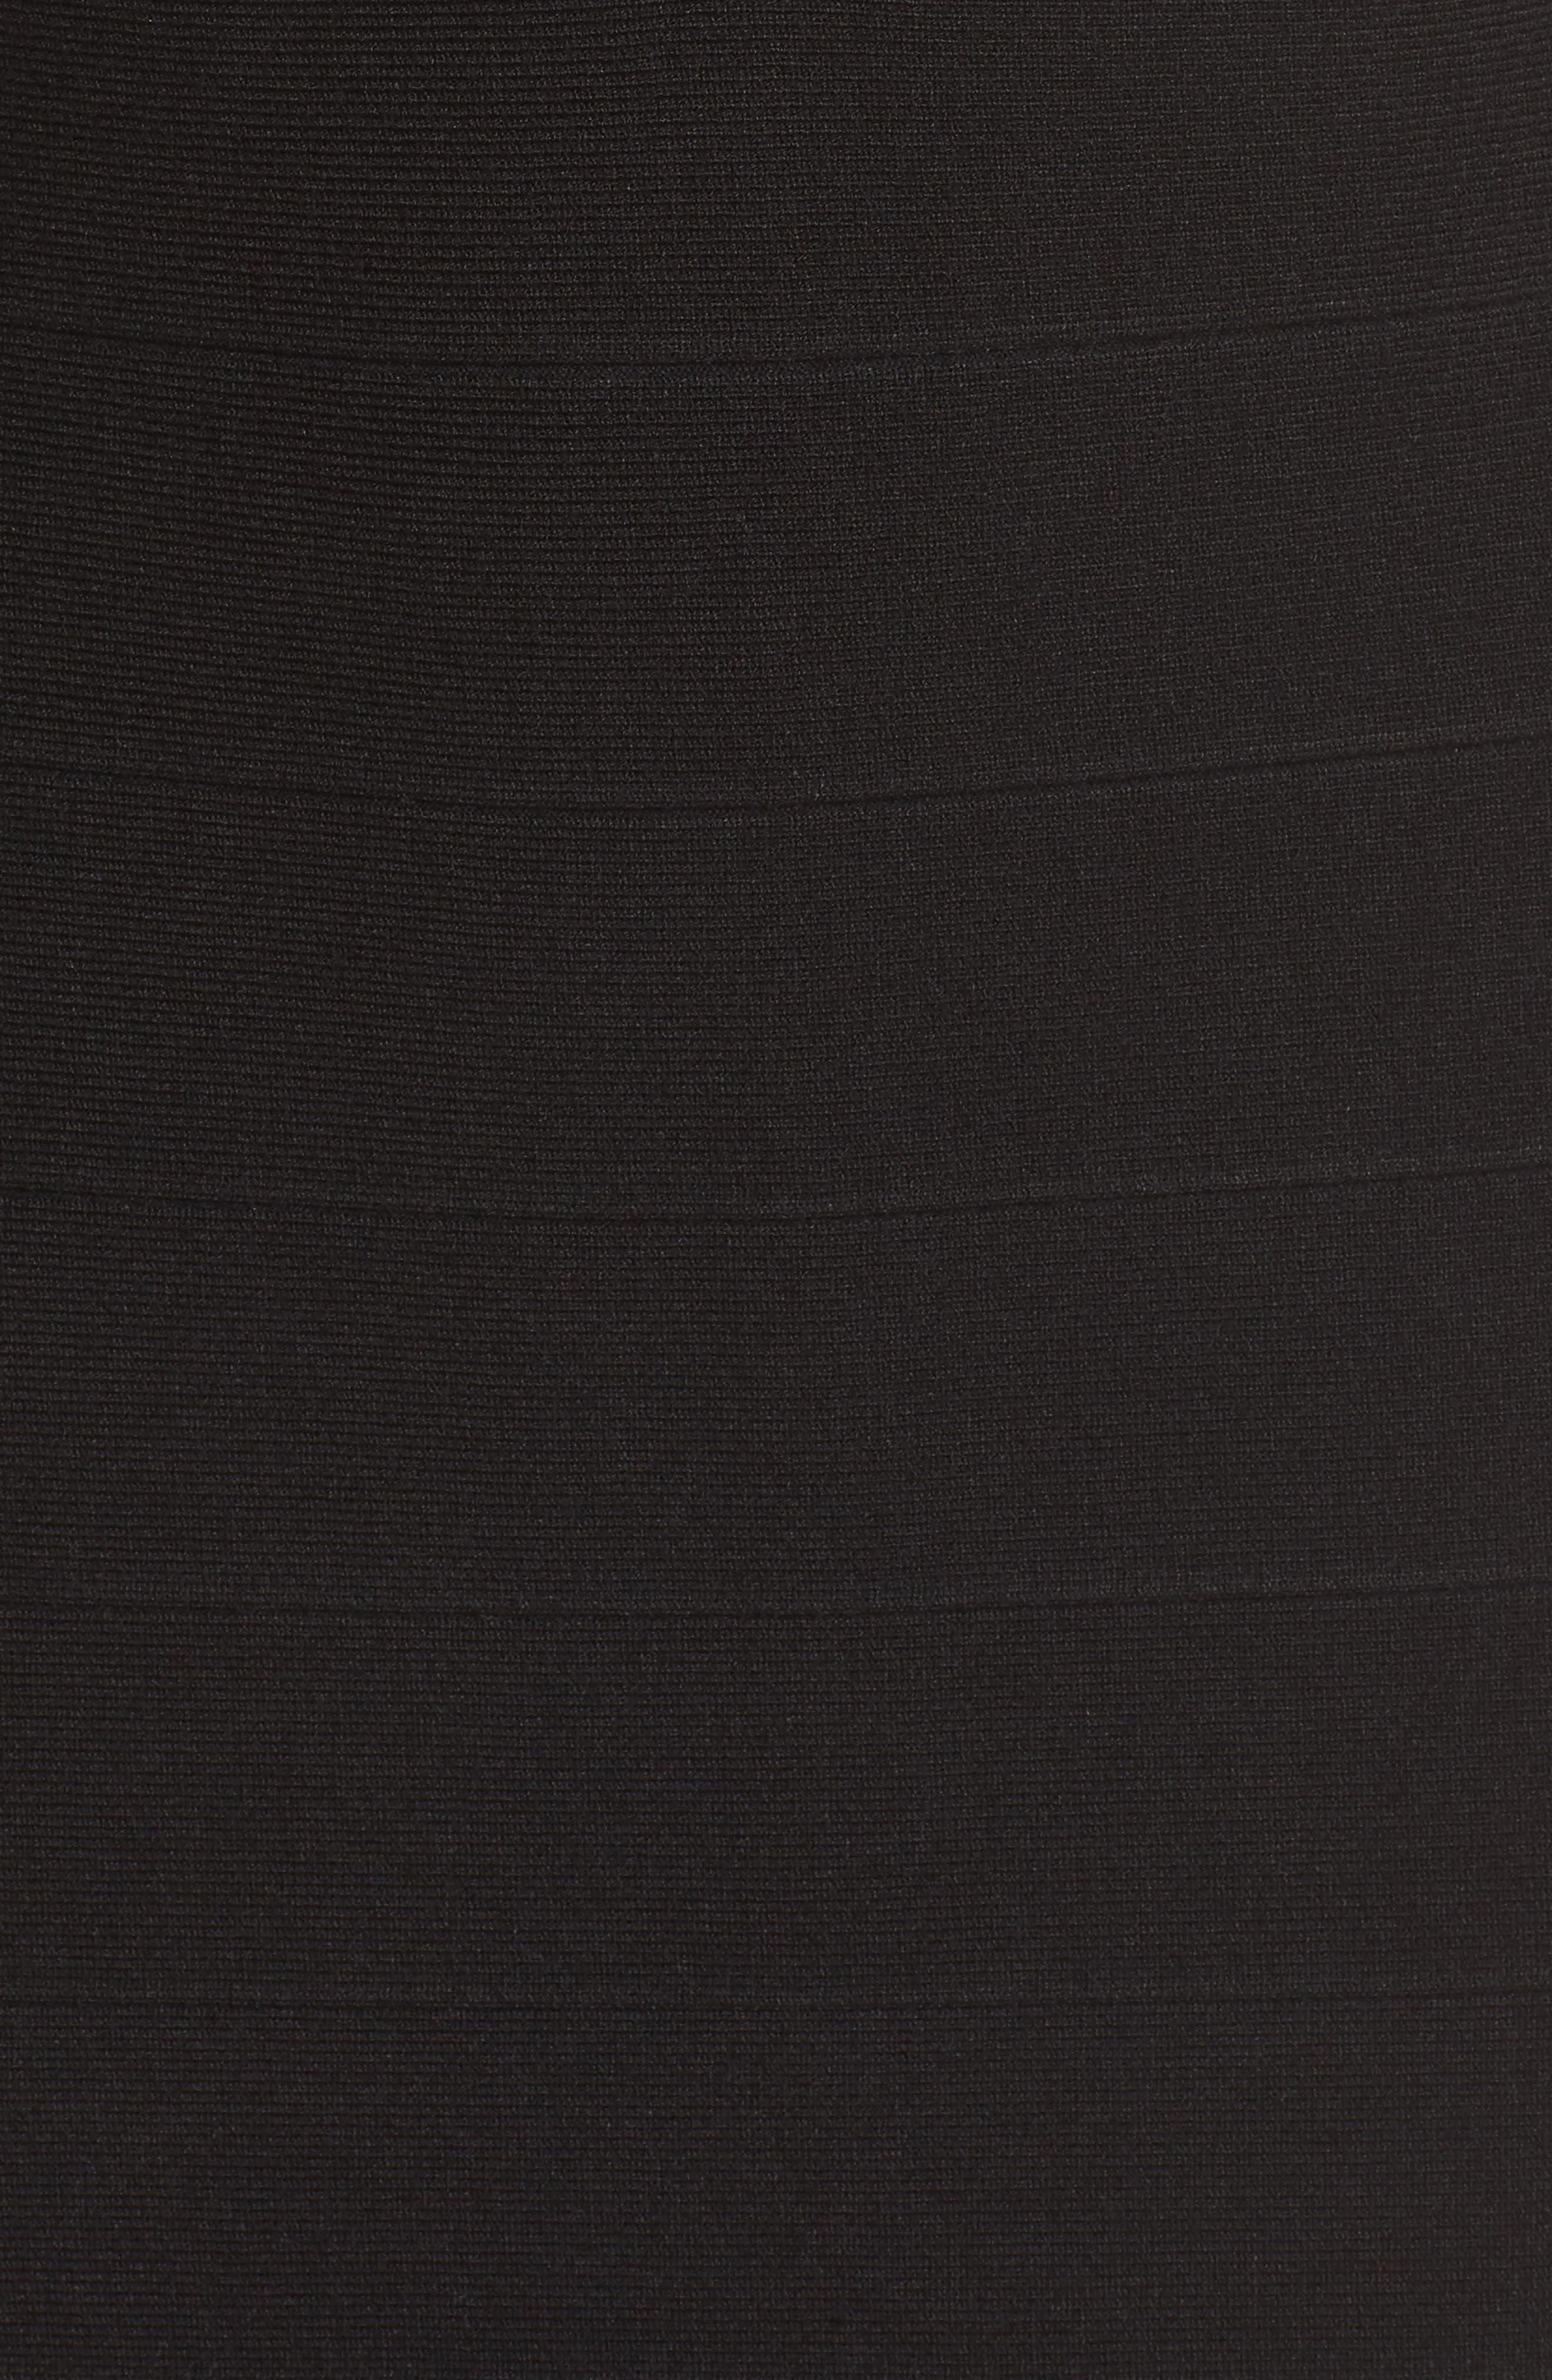 Shawl Collar Knit Sheath Dress,                             Alternate thumbnail 5, color,                             001